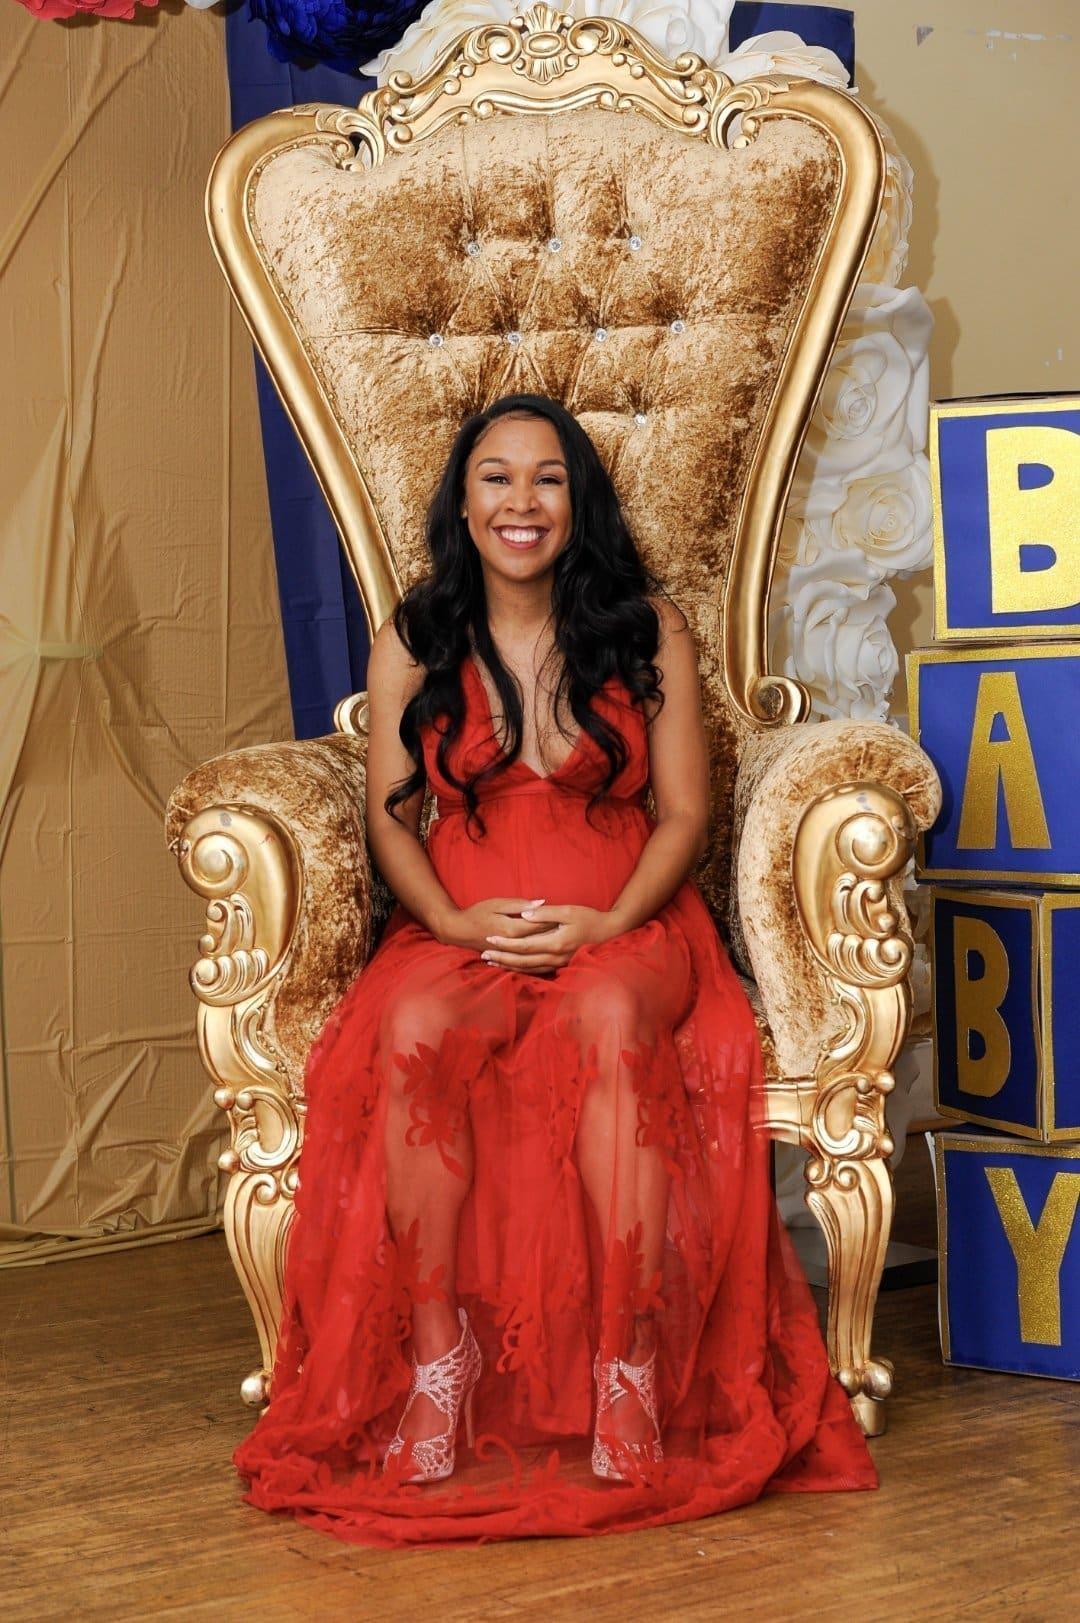 Iesha of LivingLesh wearing a red baby shower dress